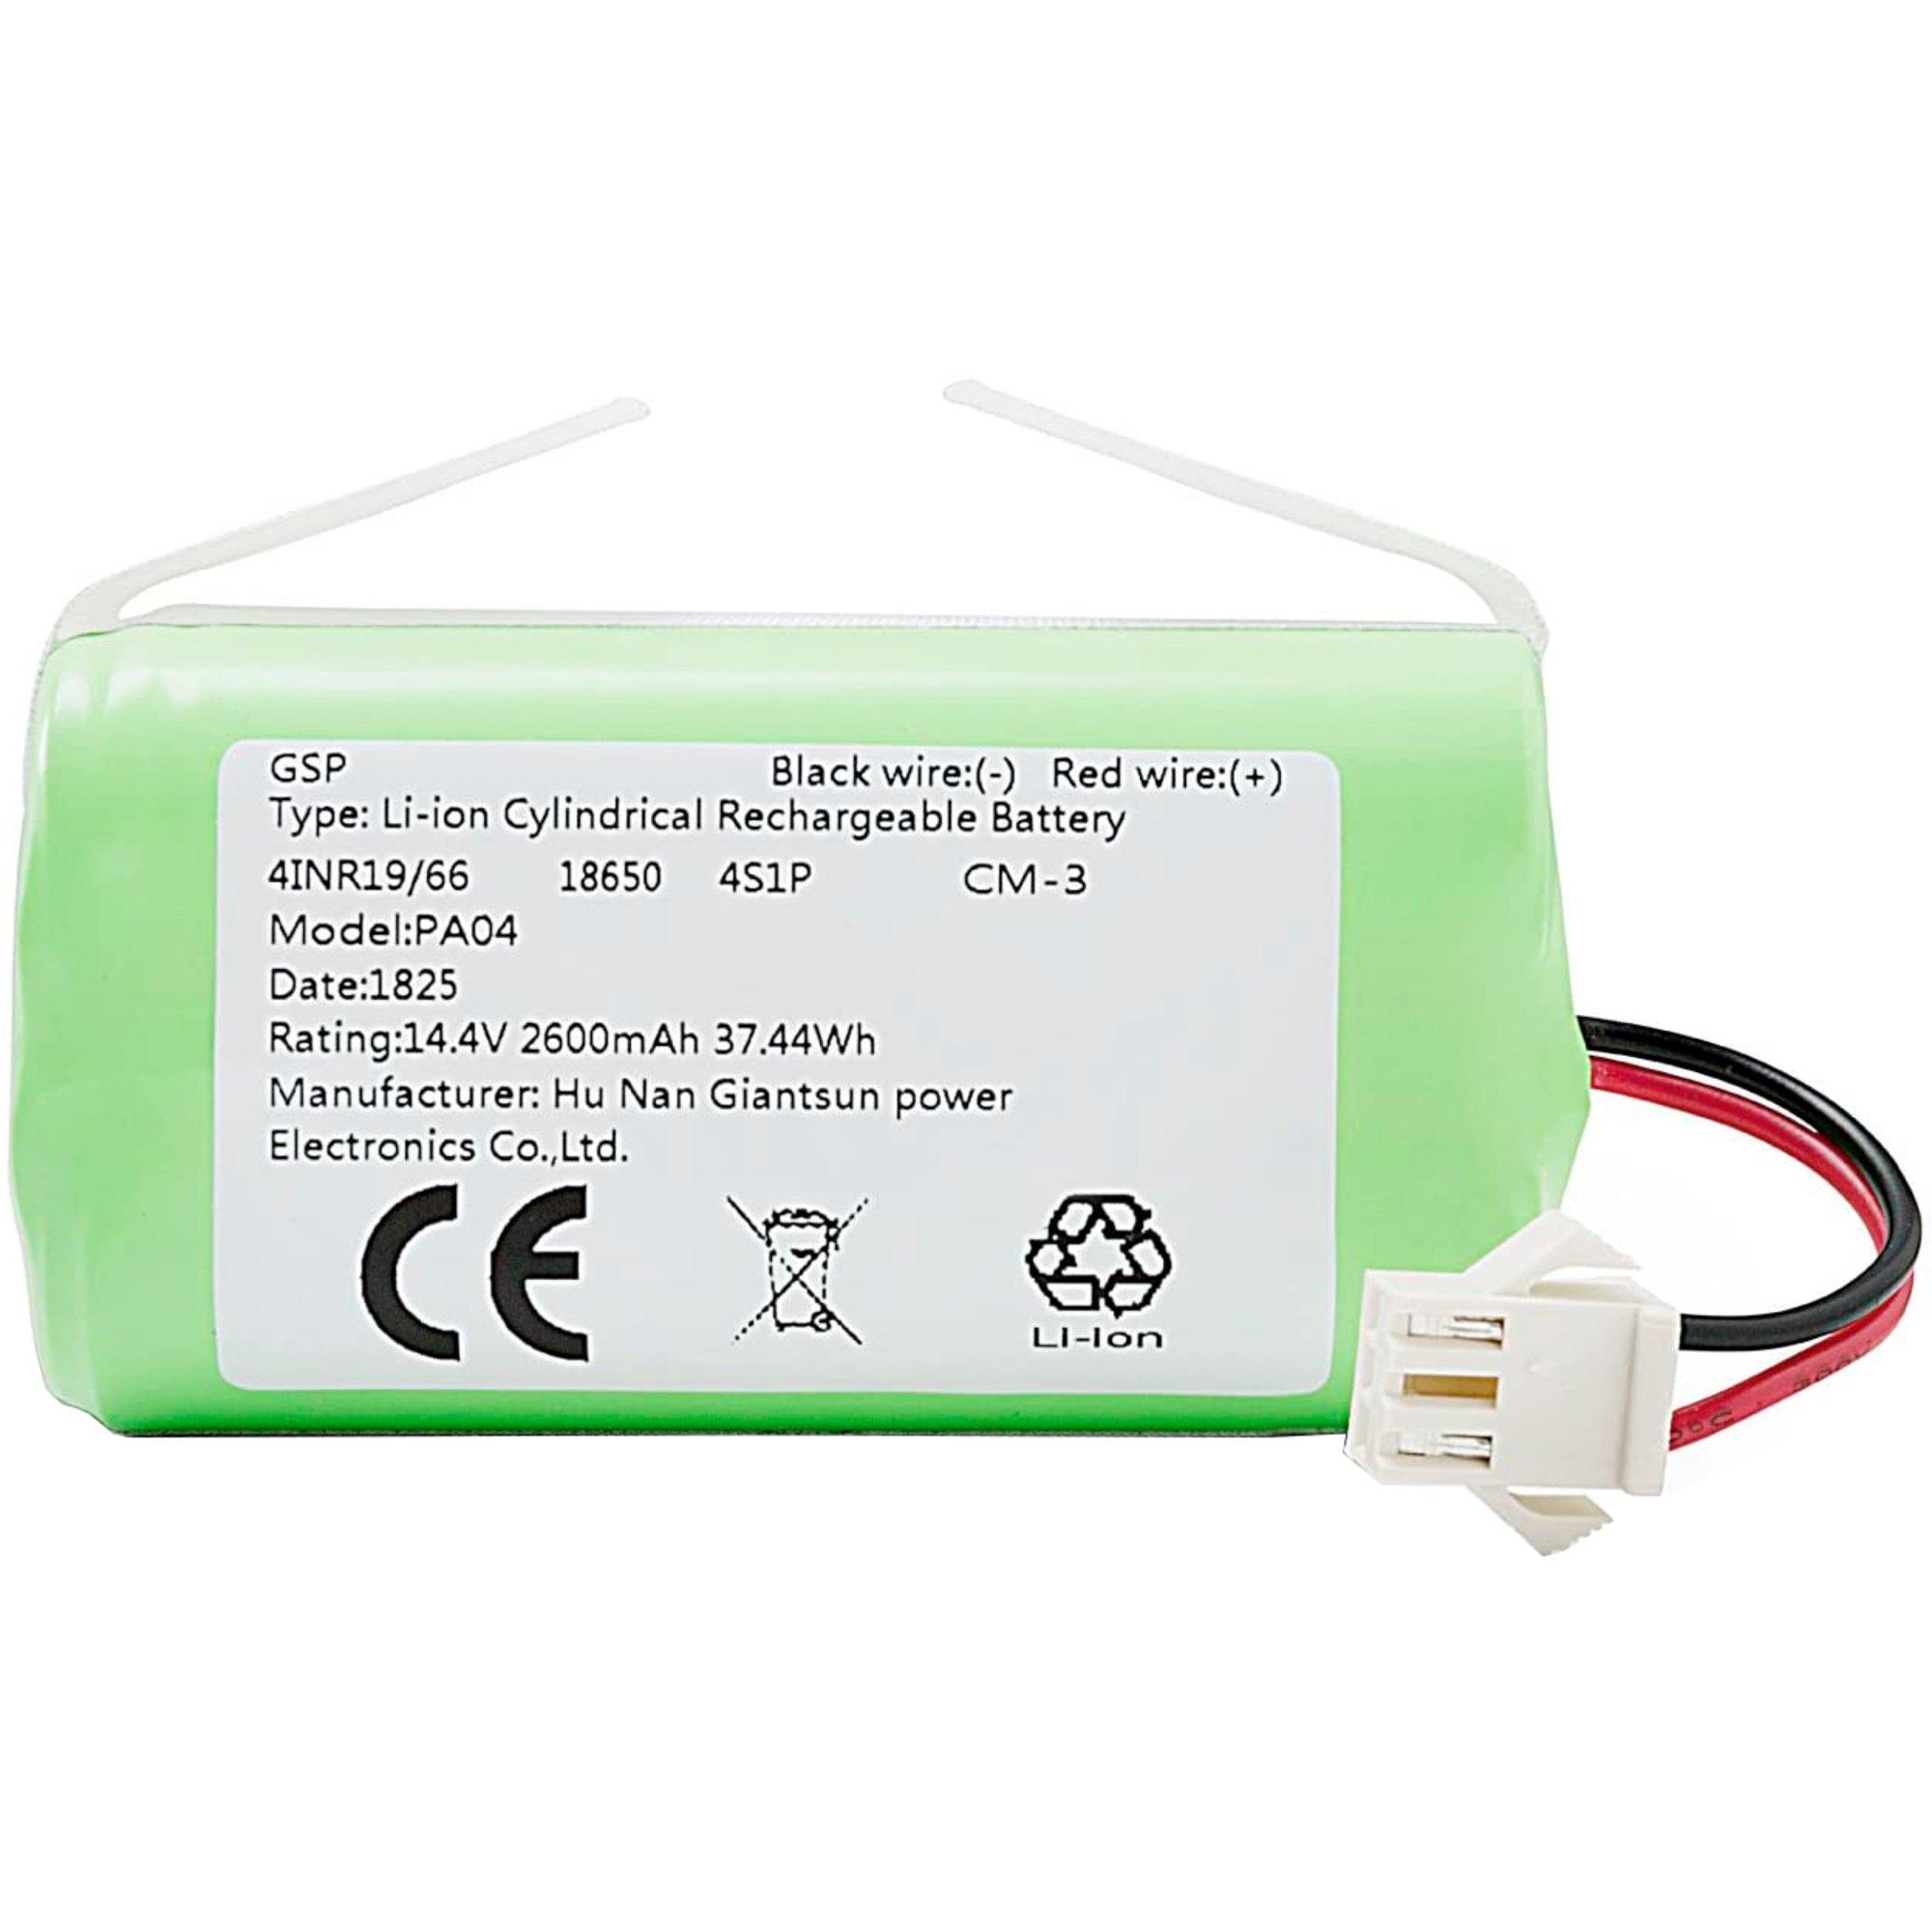 Eufy RoboVac batteripack 11S/15C/35C/G10